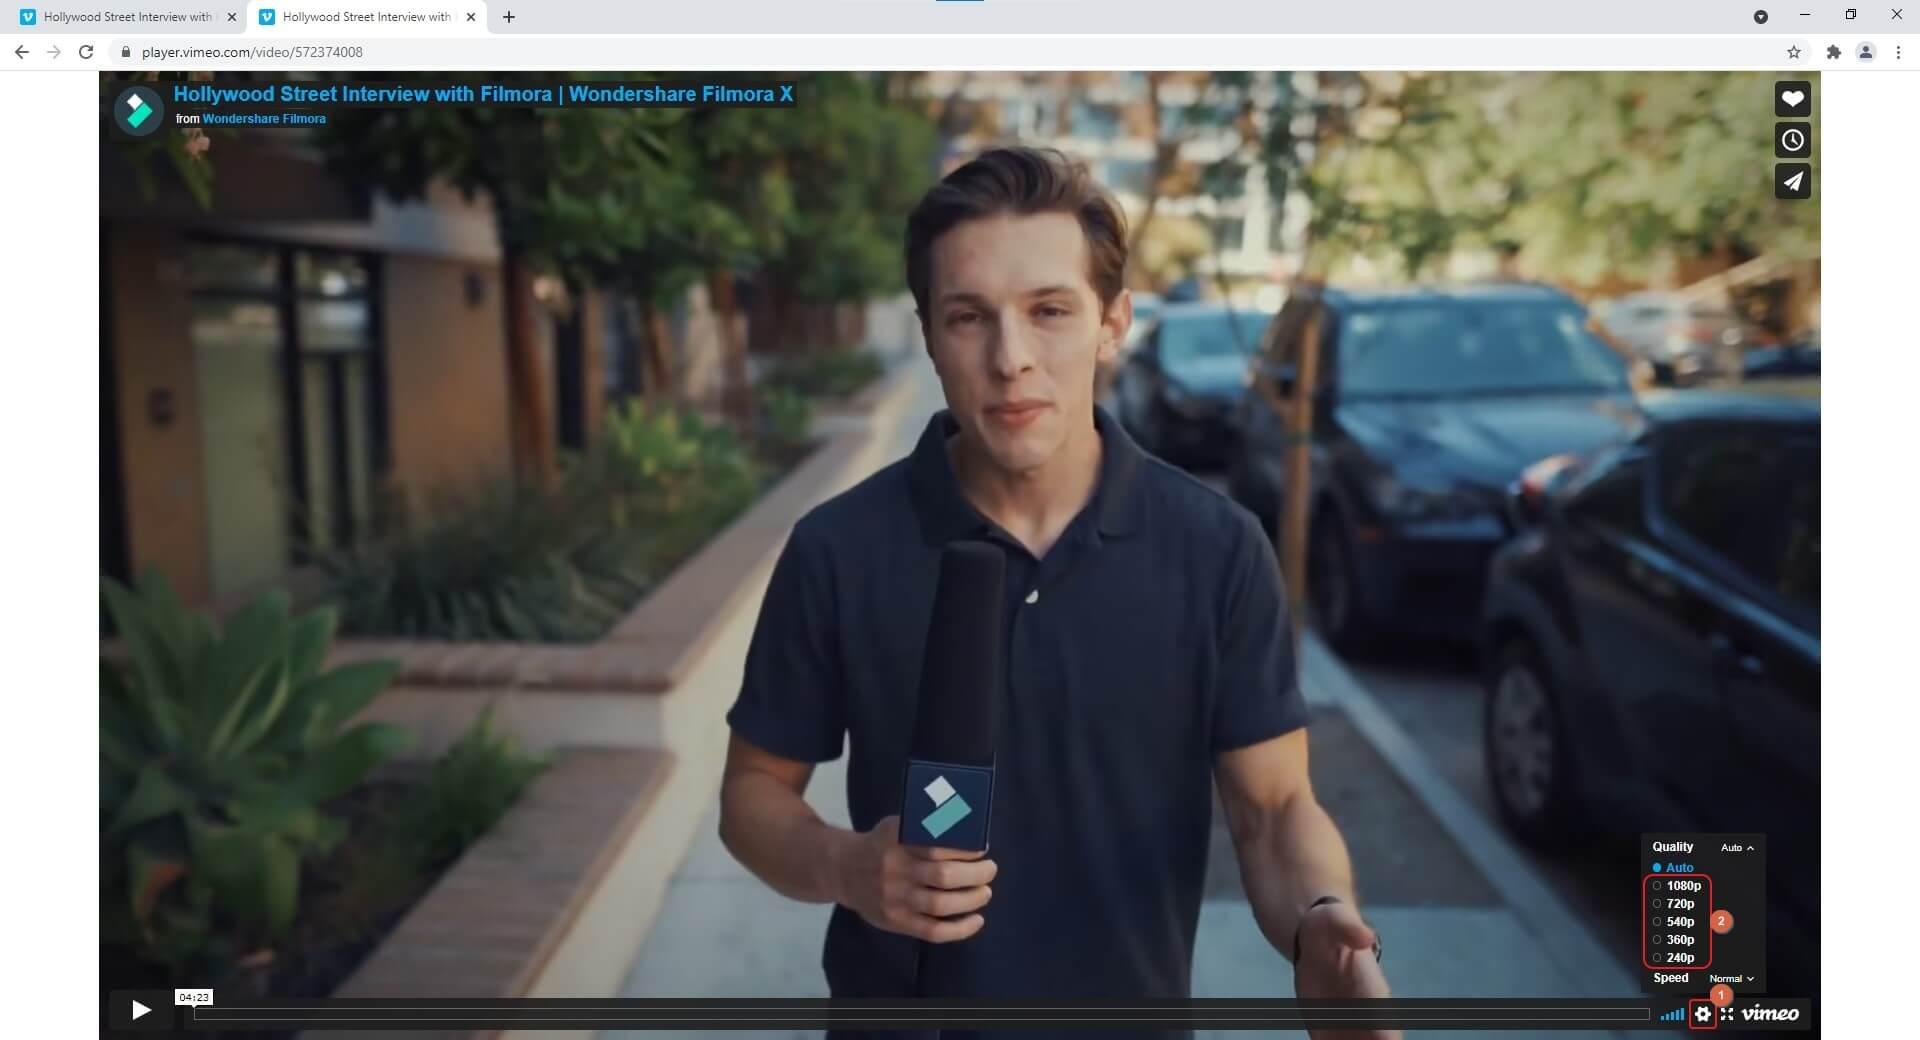 Vimeo Video Player Settings